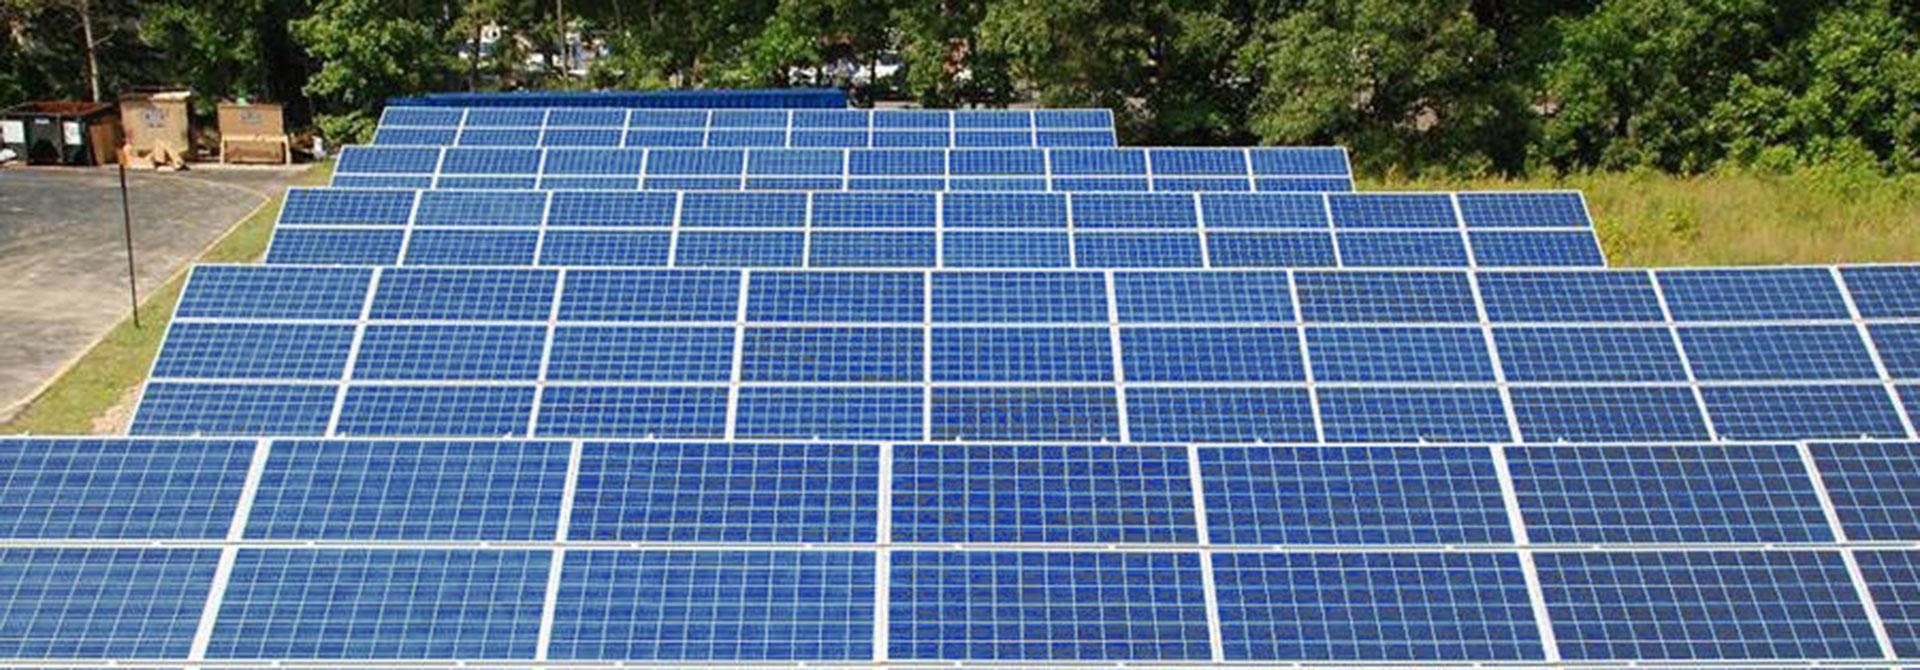 solar-photovoltaic-module